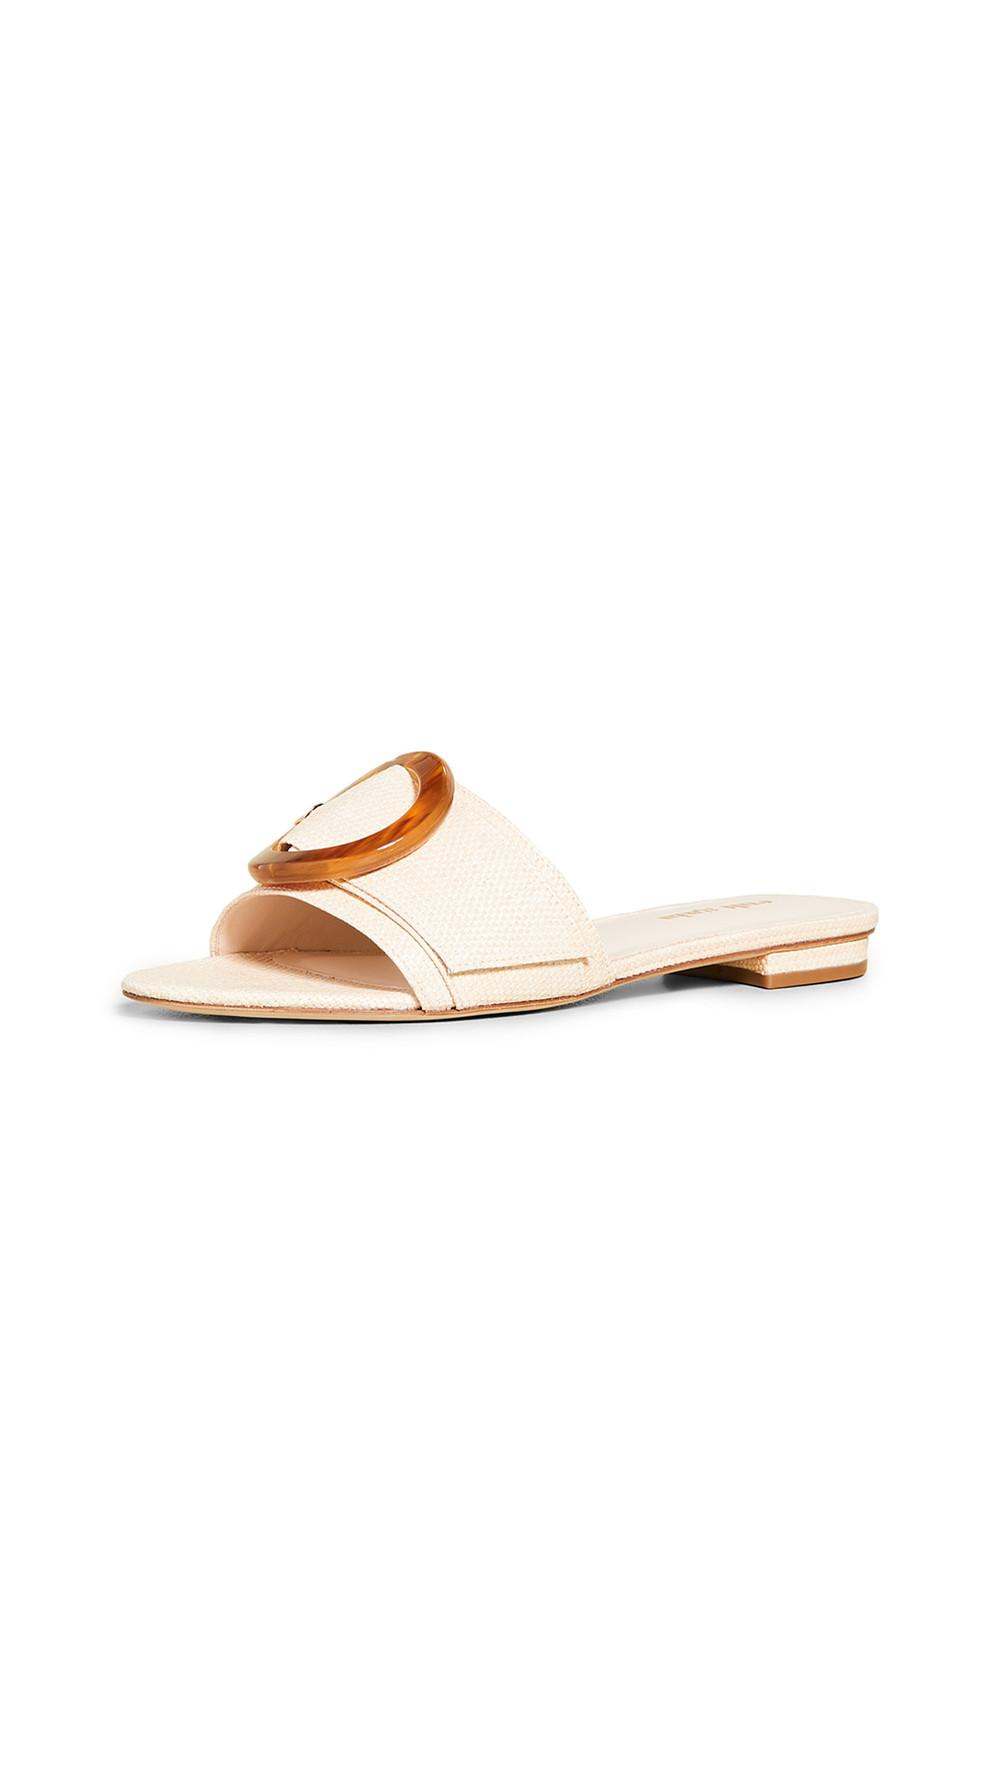 Cult Gaia Lani Sandals in natural